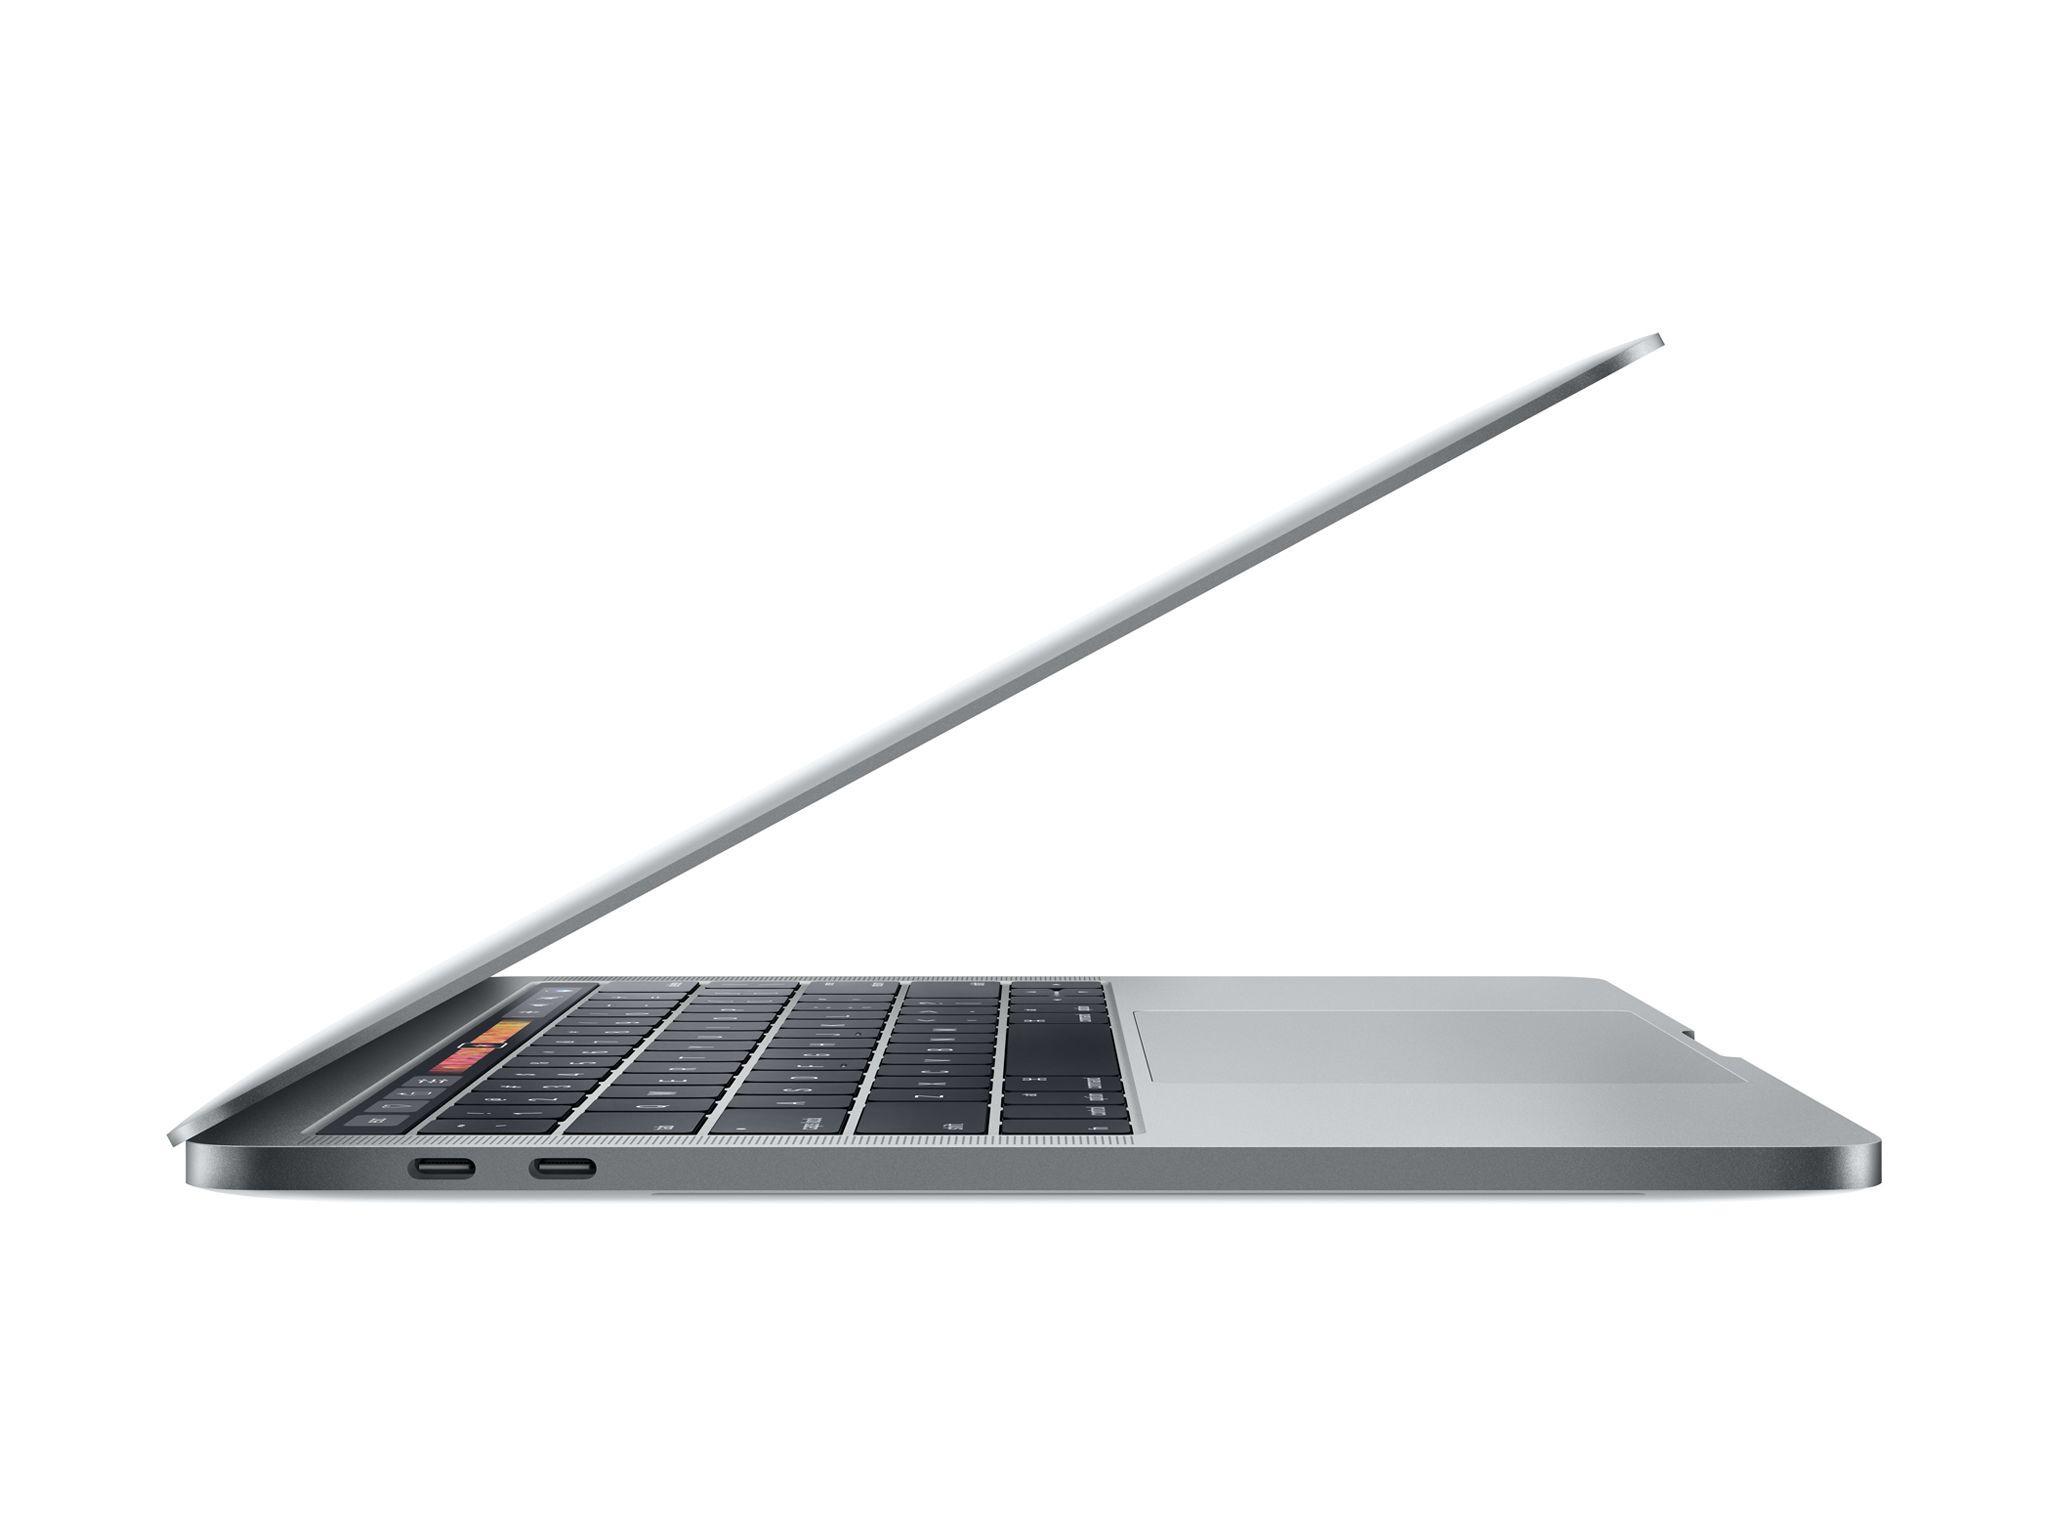 13 Inch Macbook Pro Design Awards Design Consumer Products